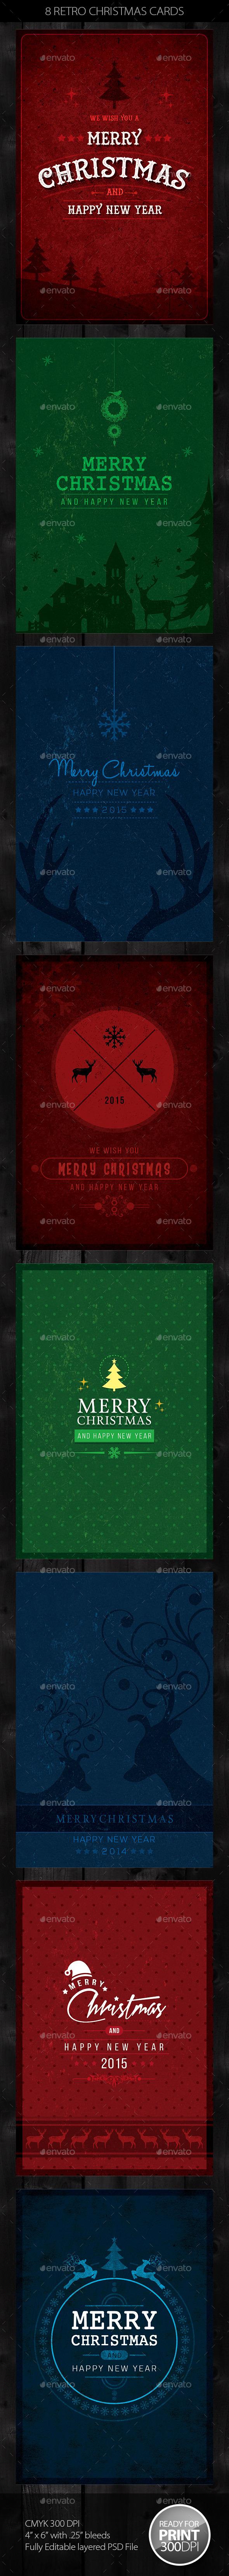 christmas-cards10